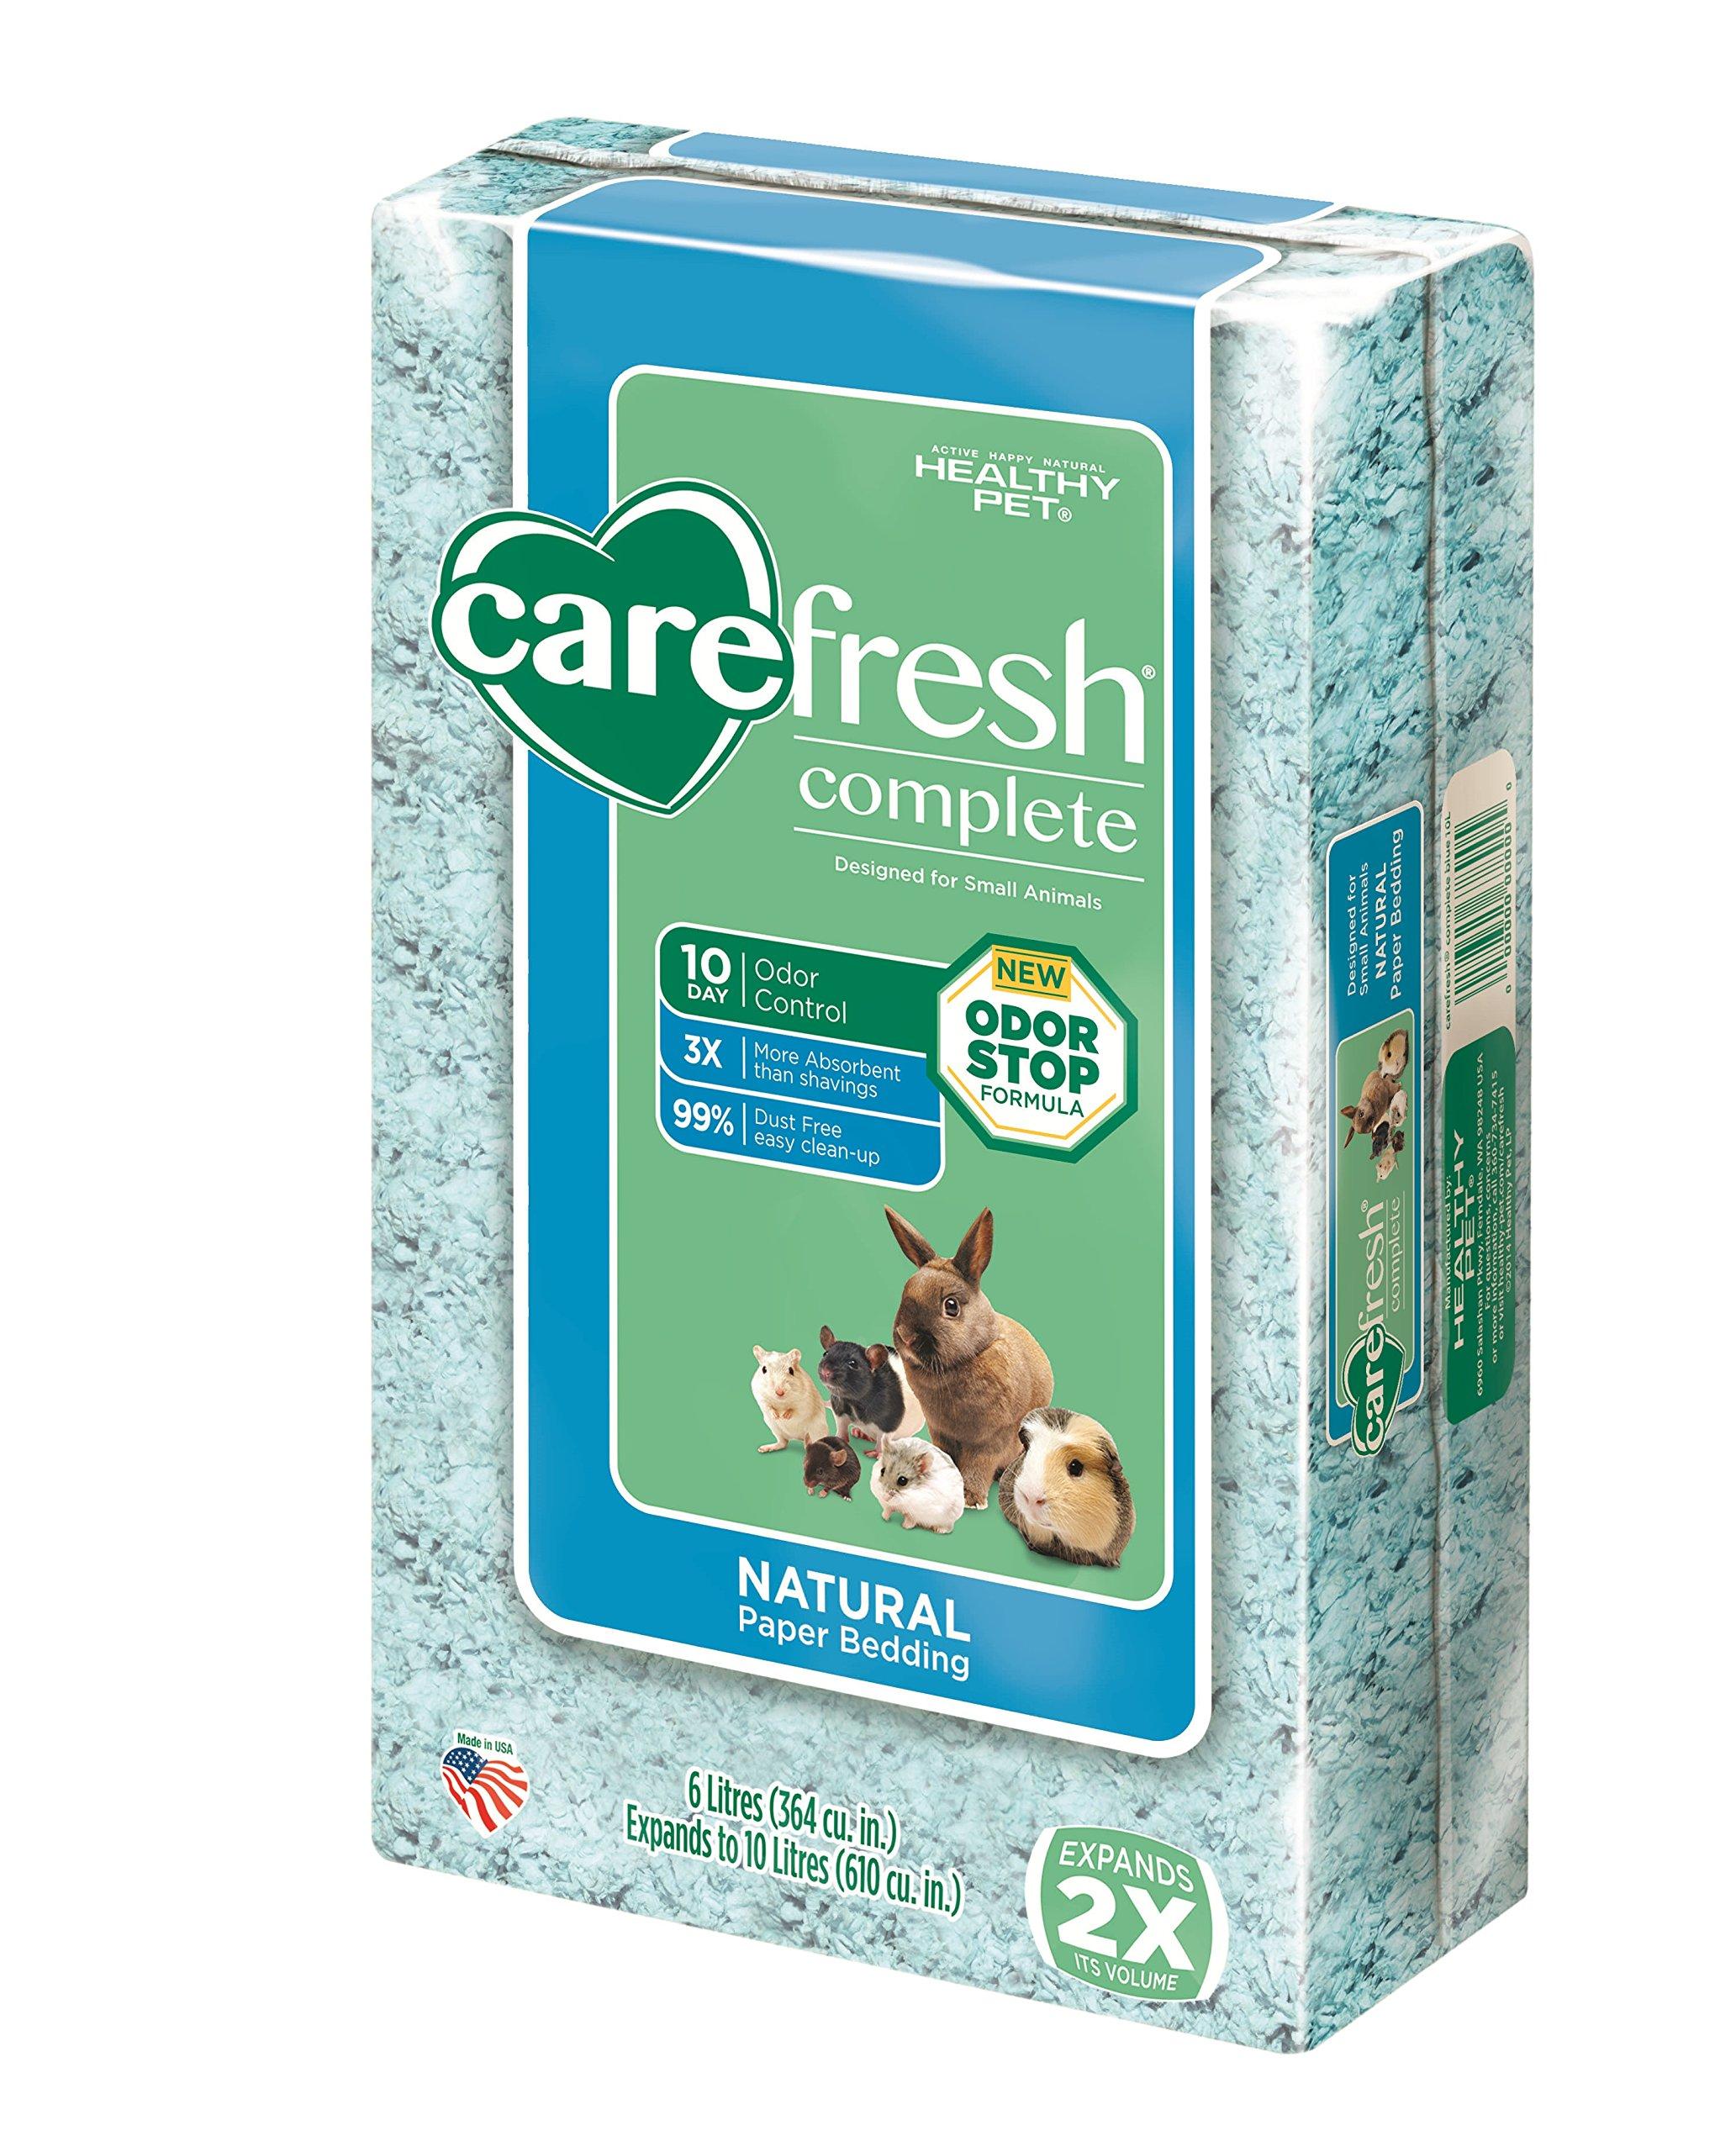 CareFRESH Pet Bedding